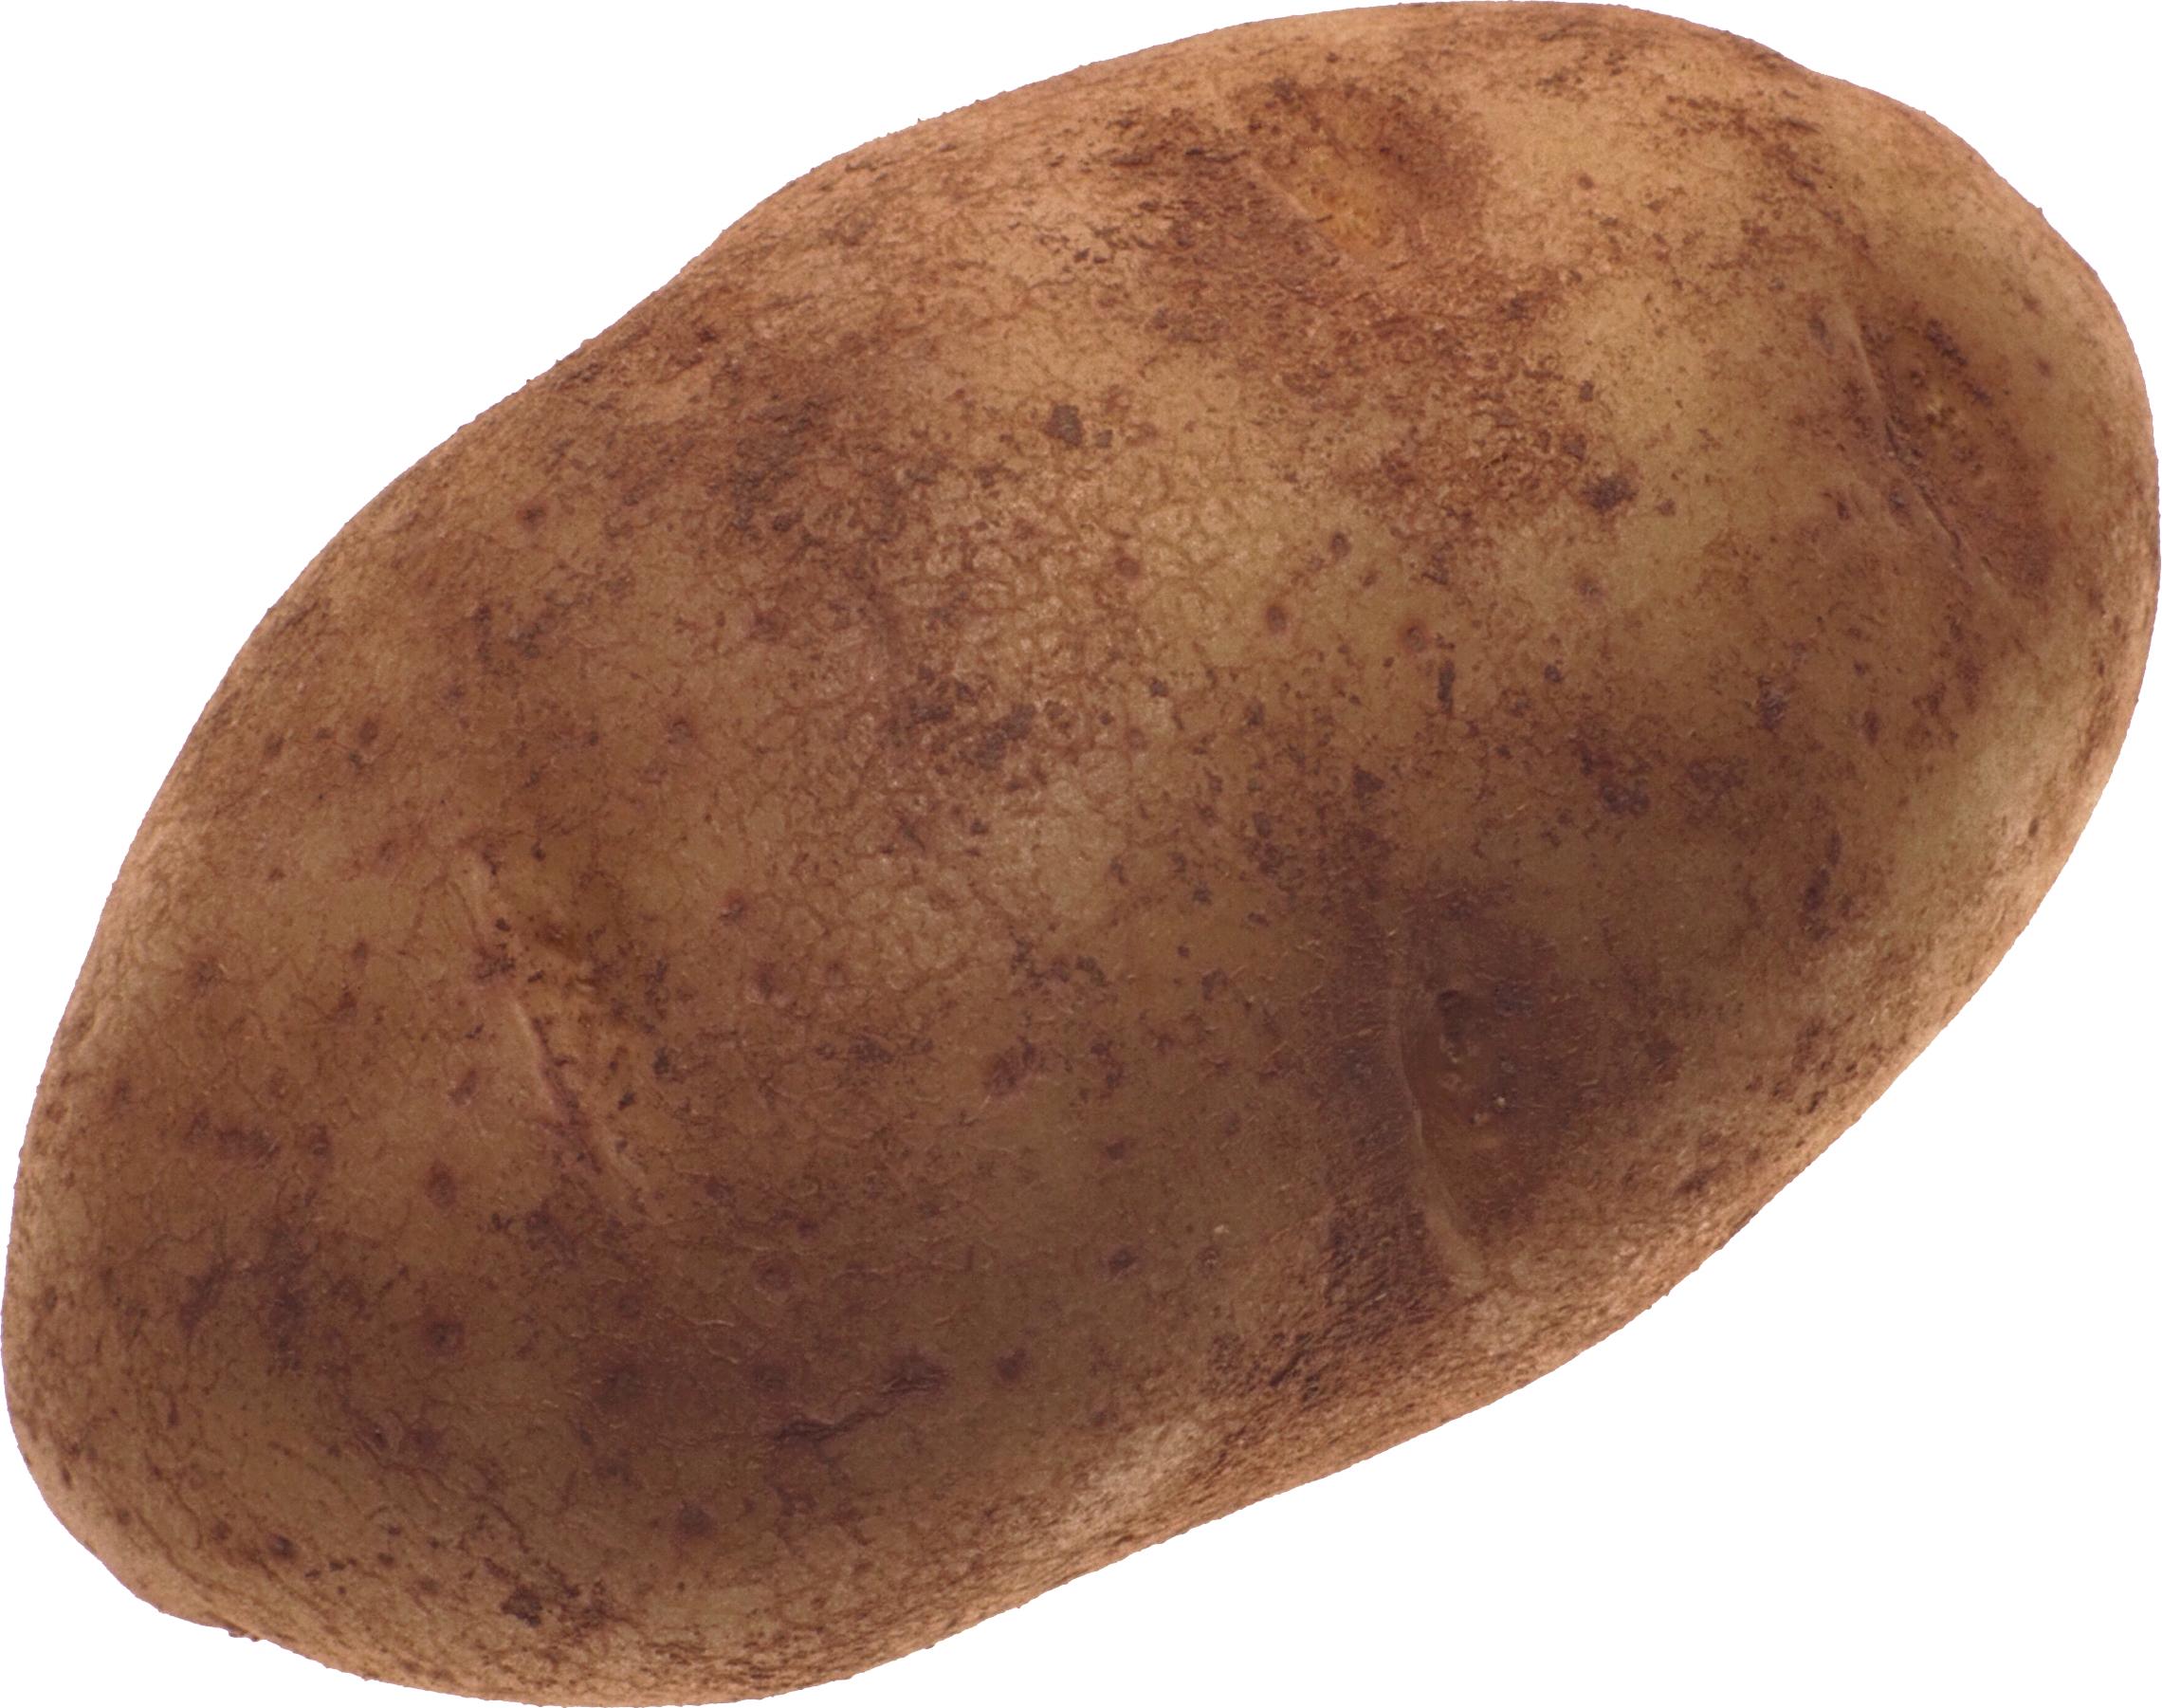 Potato PNG - 7089